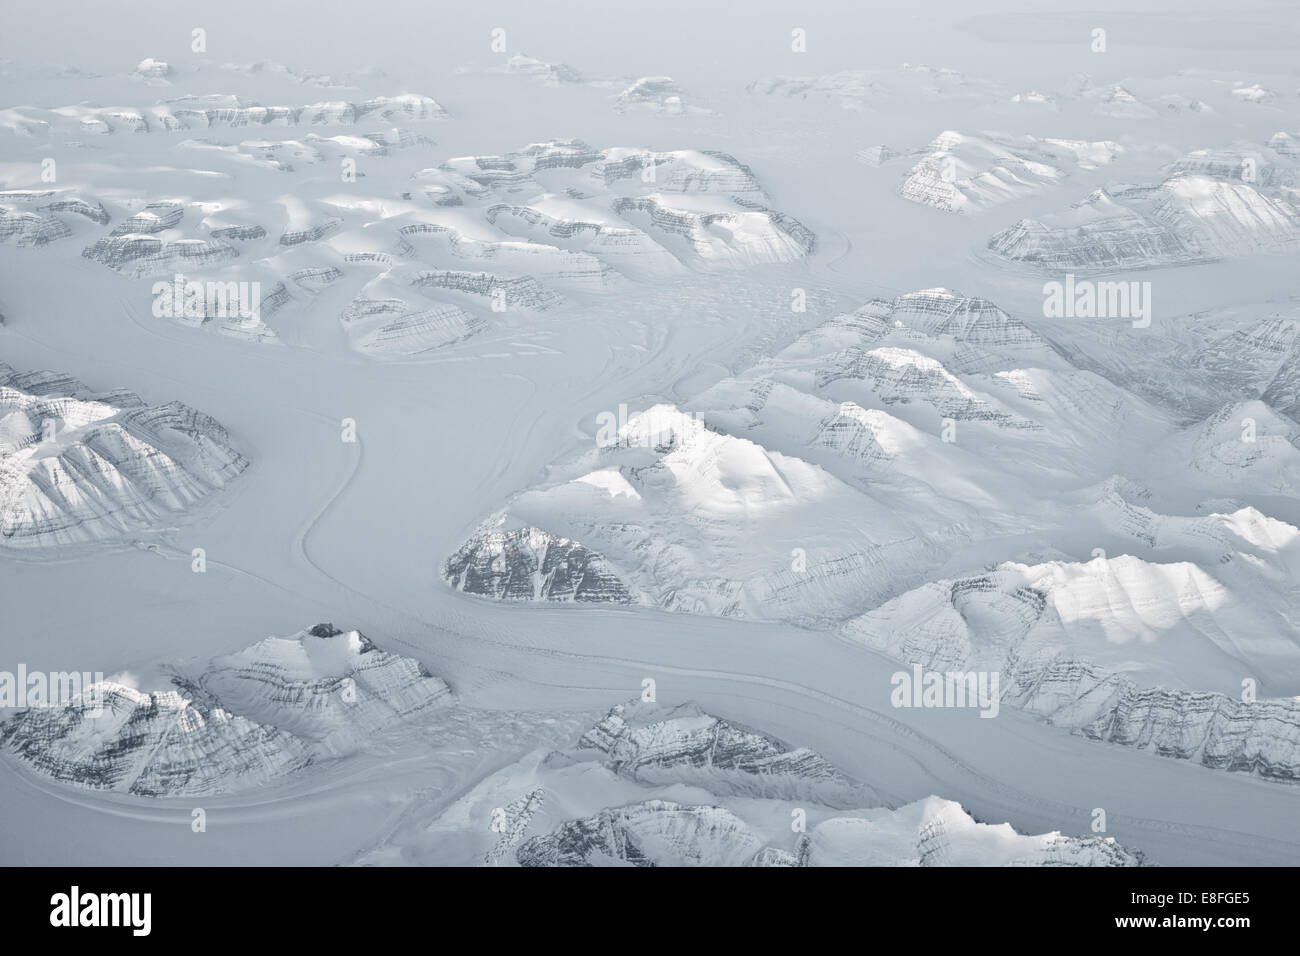 Montagne innevate, Groenlandia Immagini Stock